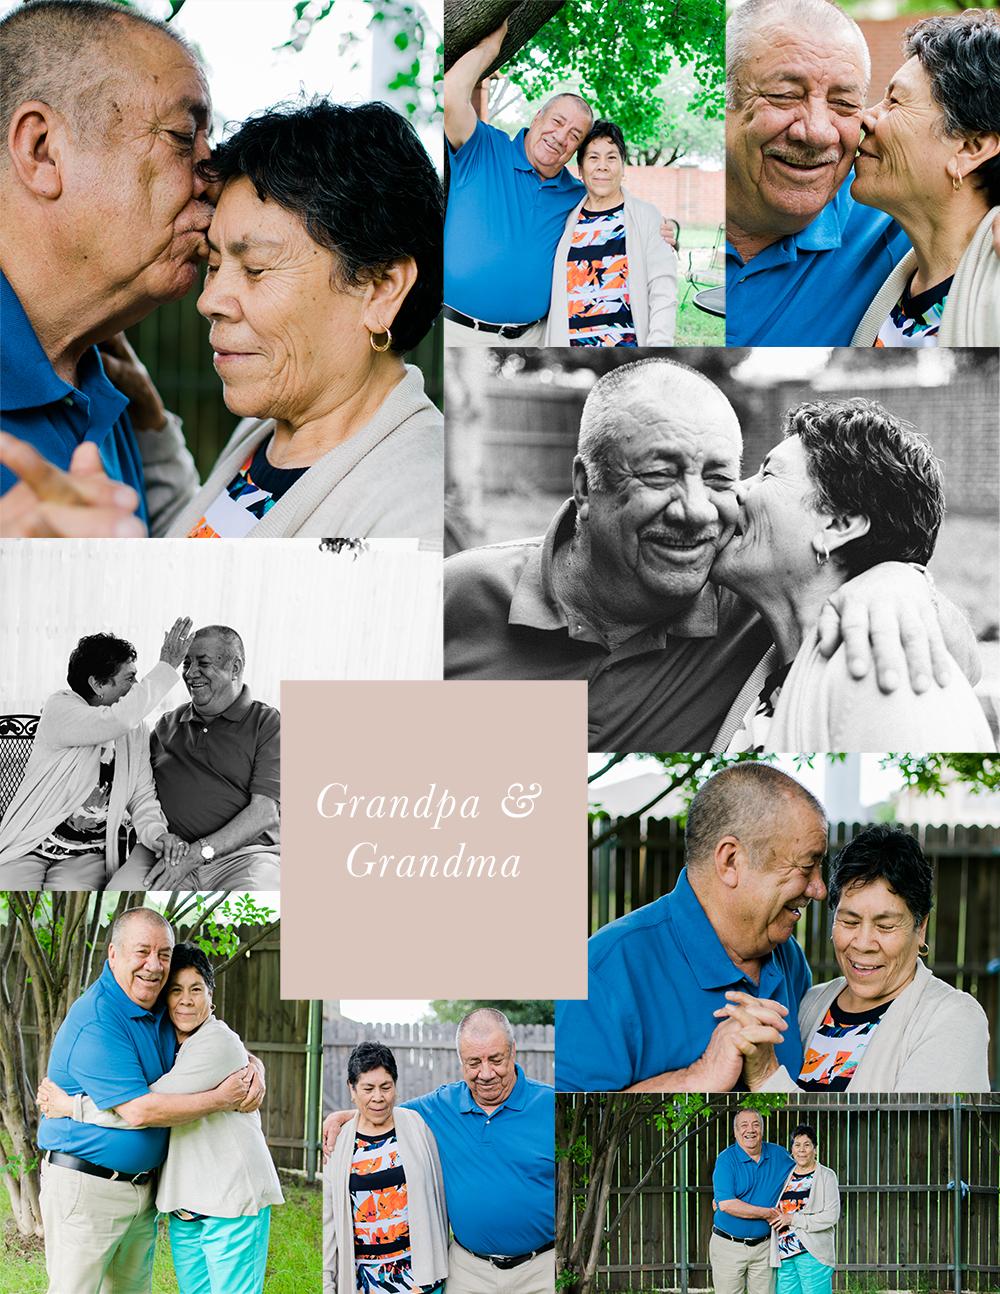 dallas-fort worth-couples-photographer-jasmine-adisbeth-photography-grandparents